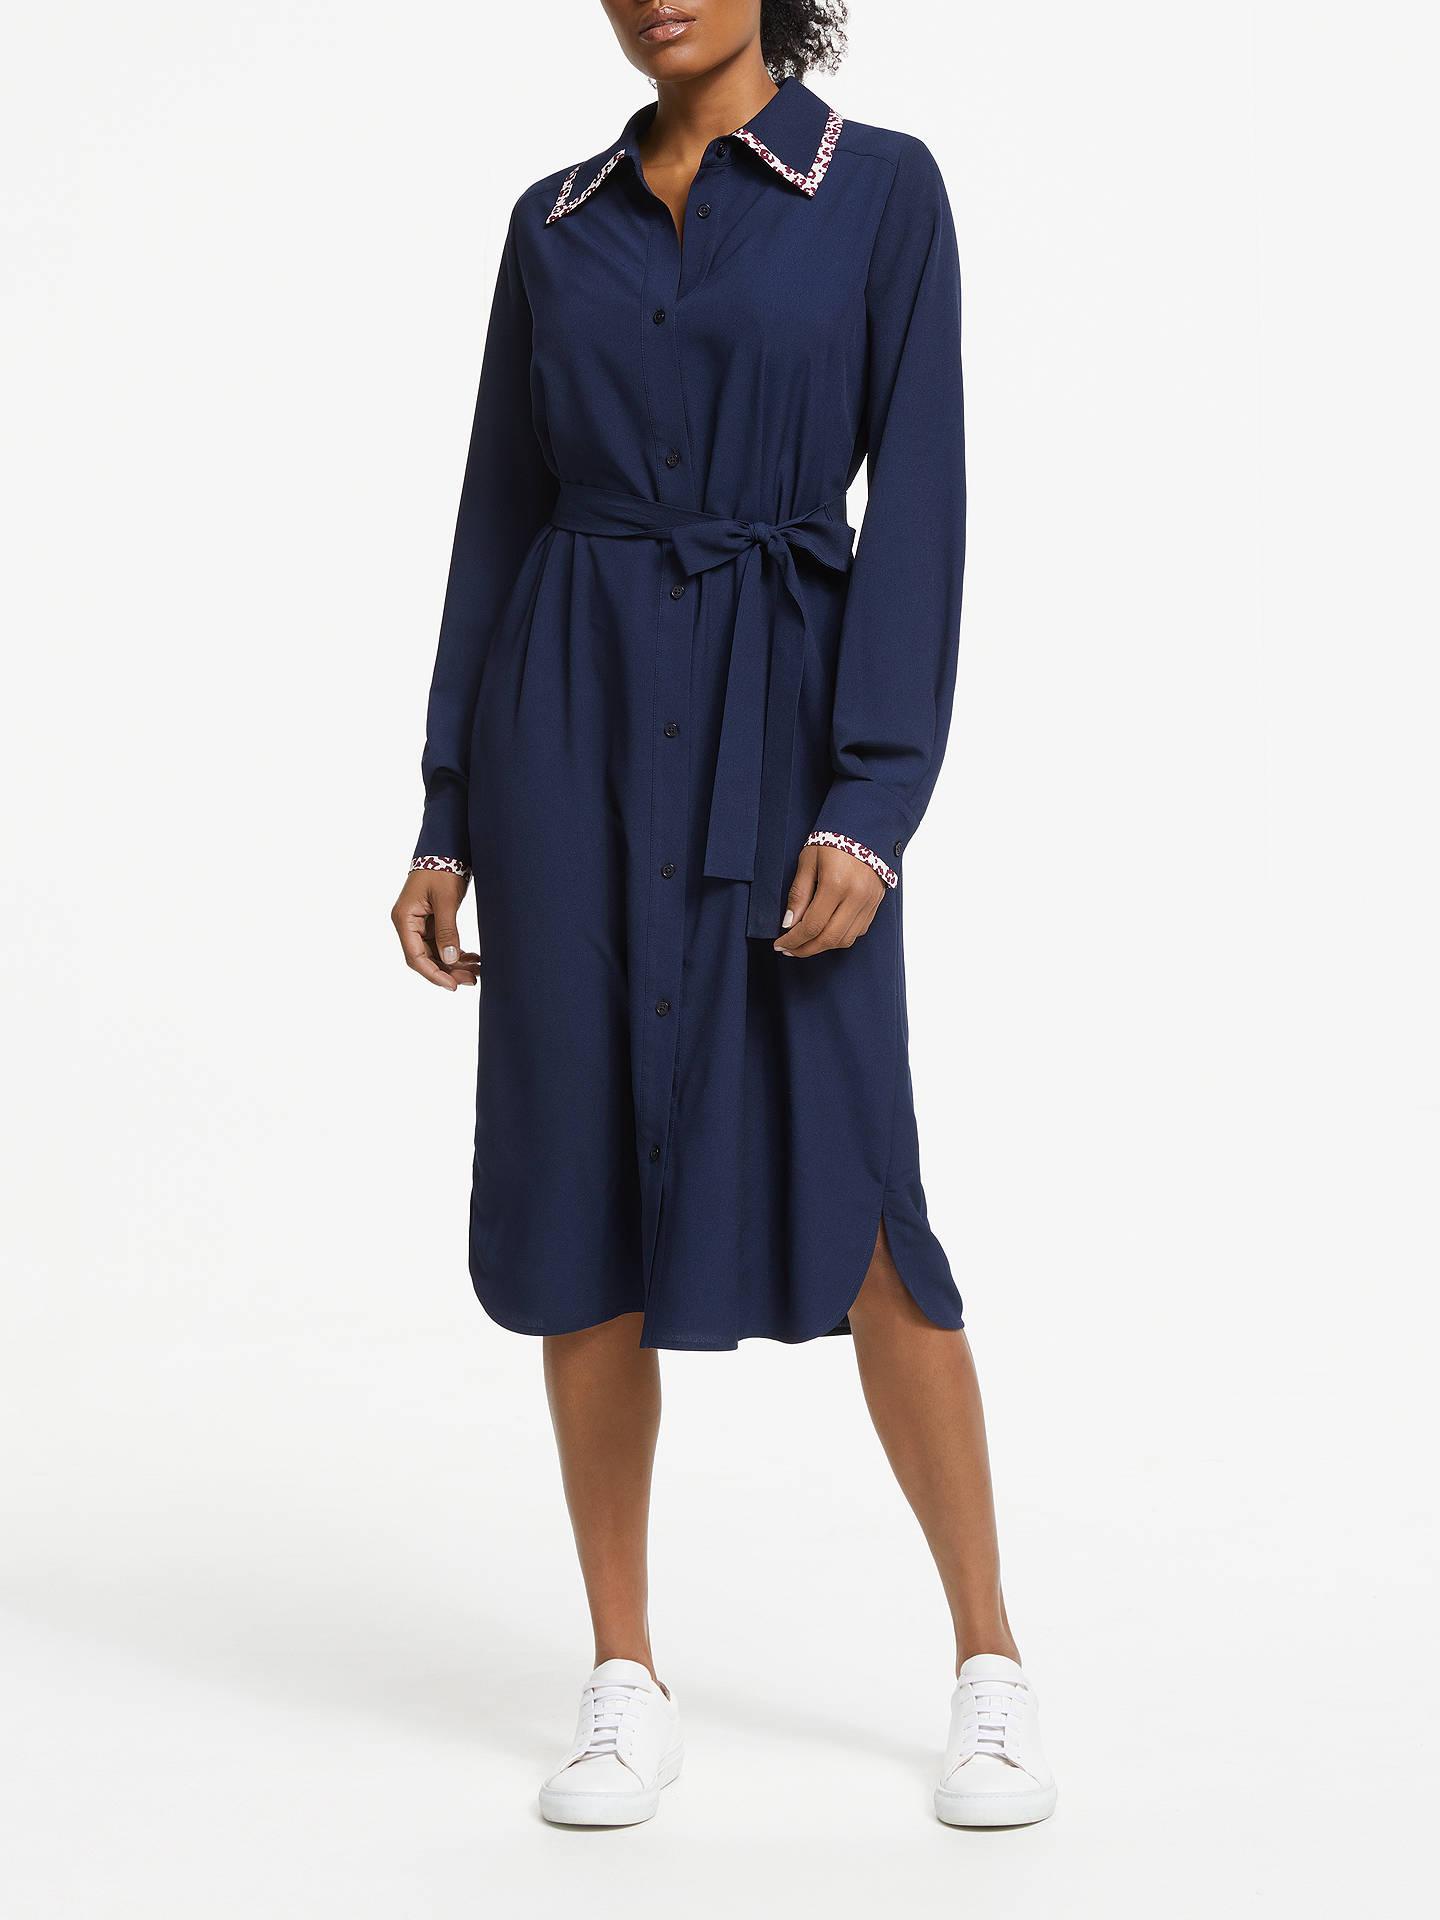 d1c1c27c5e0f1 Buy Essentiel Antwerp Sama Shirt Dress, Navy Blue, 10 Online at  johnlewis.com ...